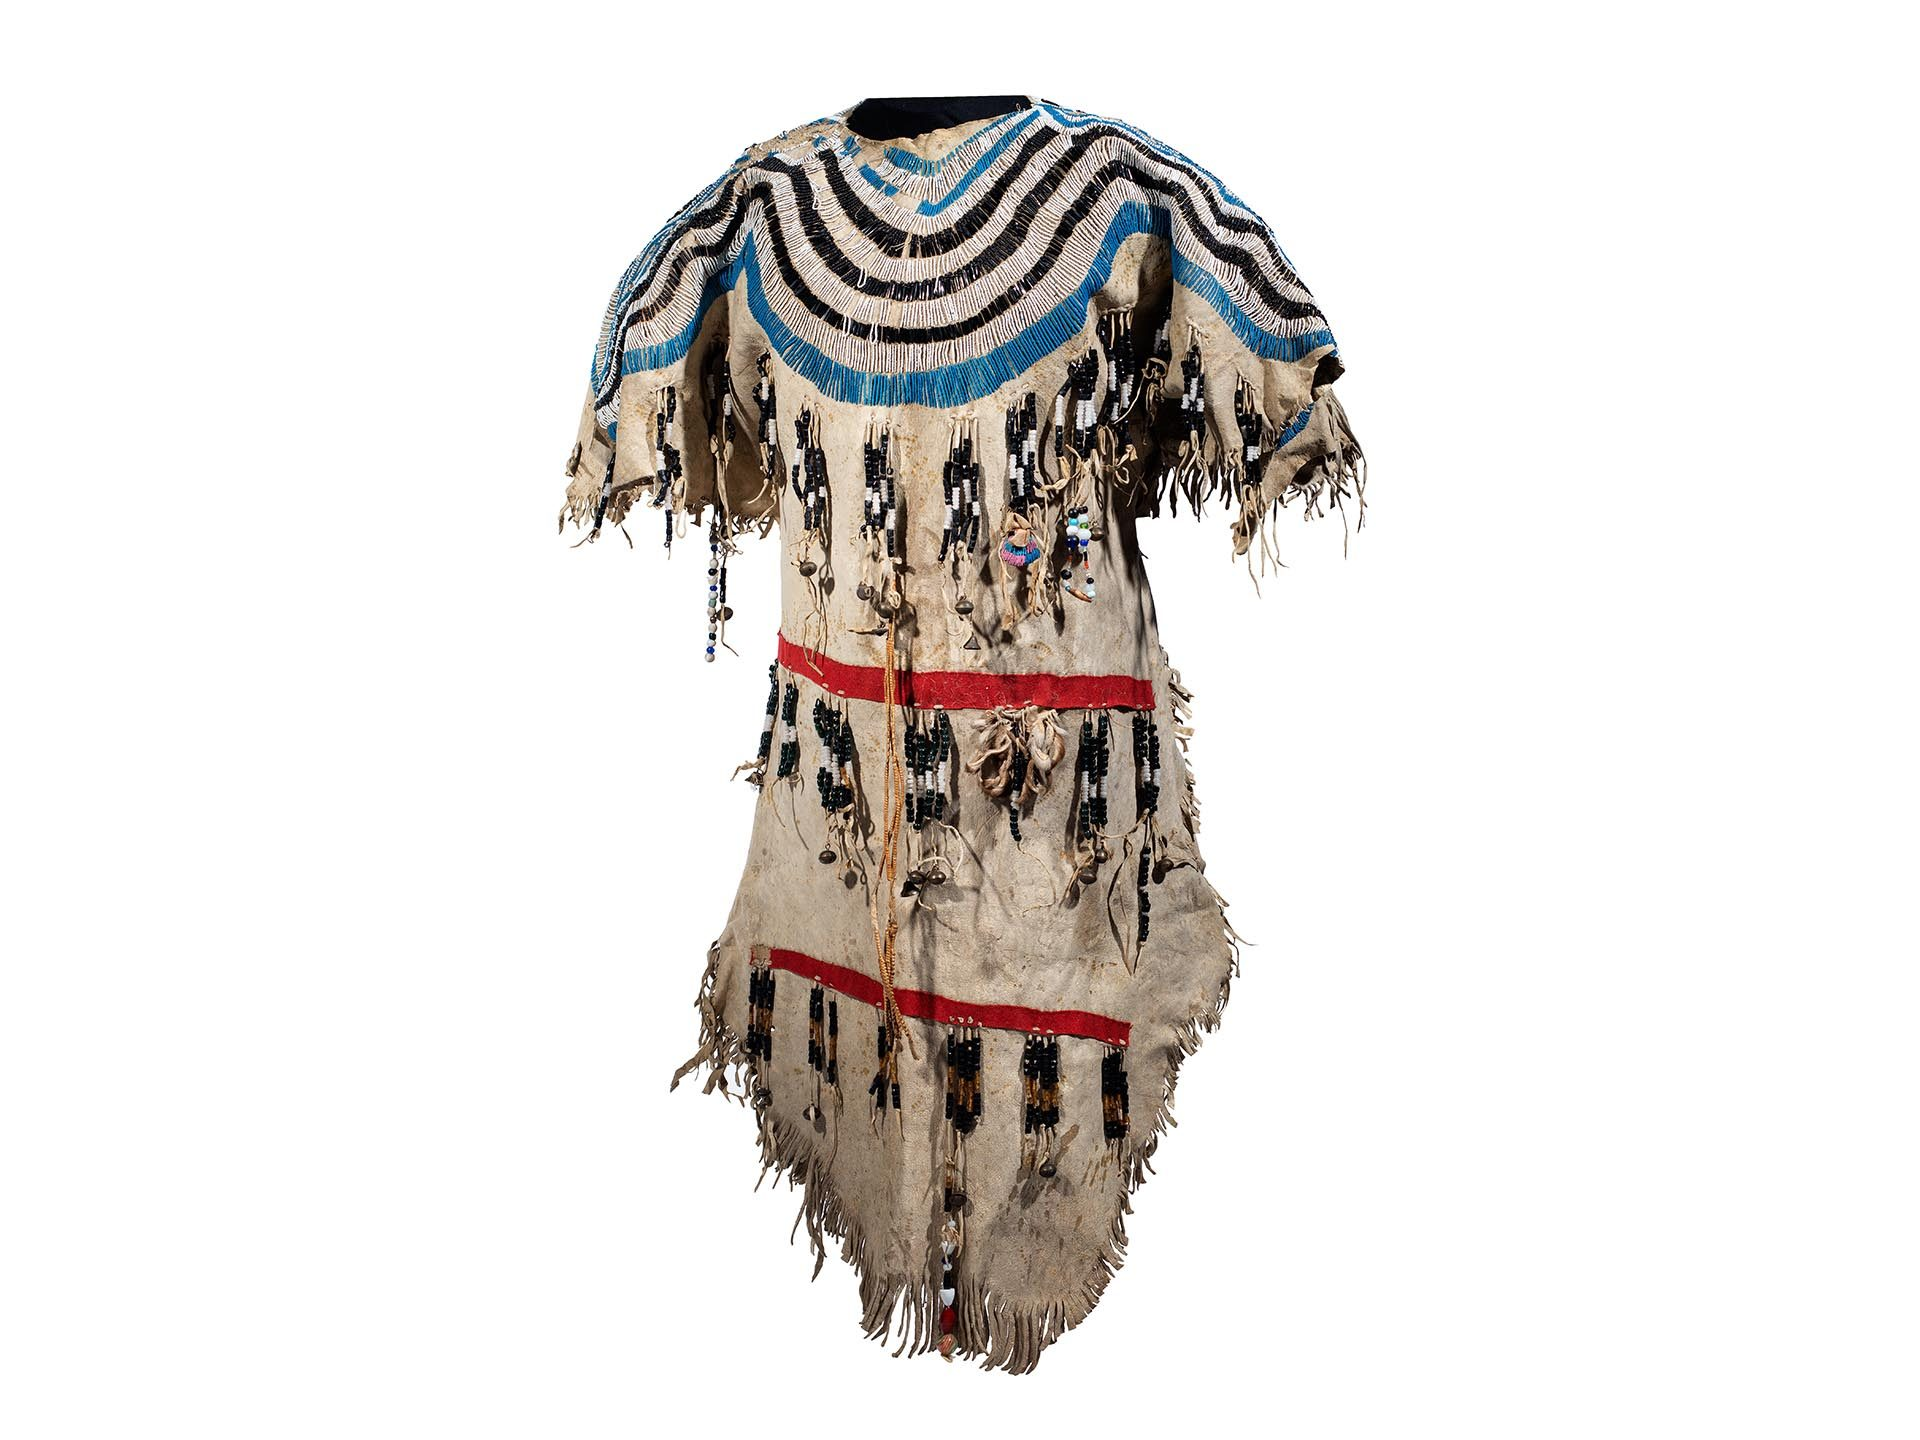 Blackfeet beaded hide dress